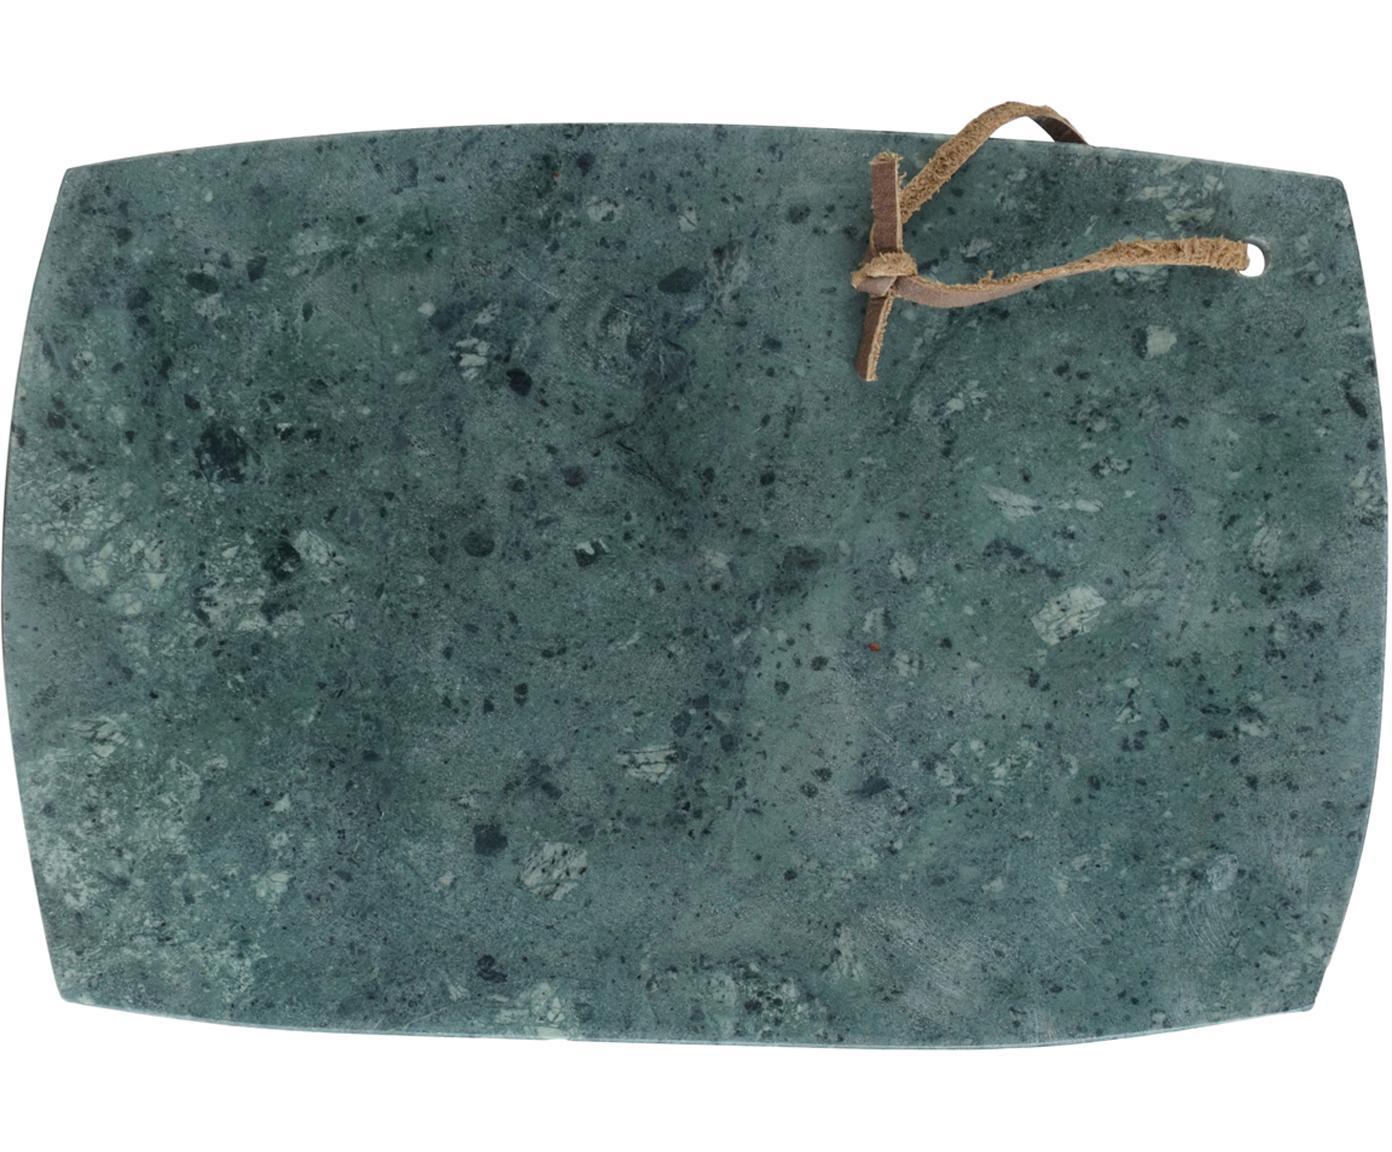 Snijplank Chopchop, Marmer, Groen, 20 x 30 cm